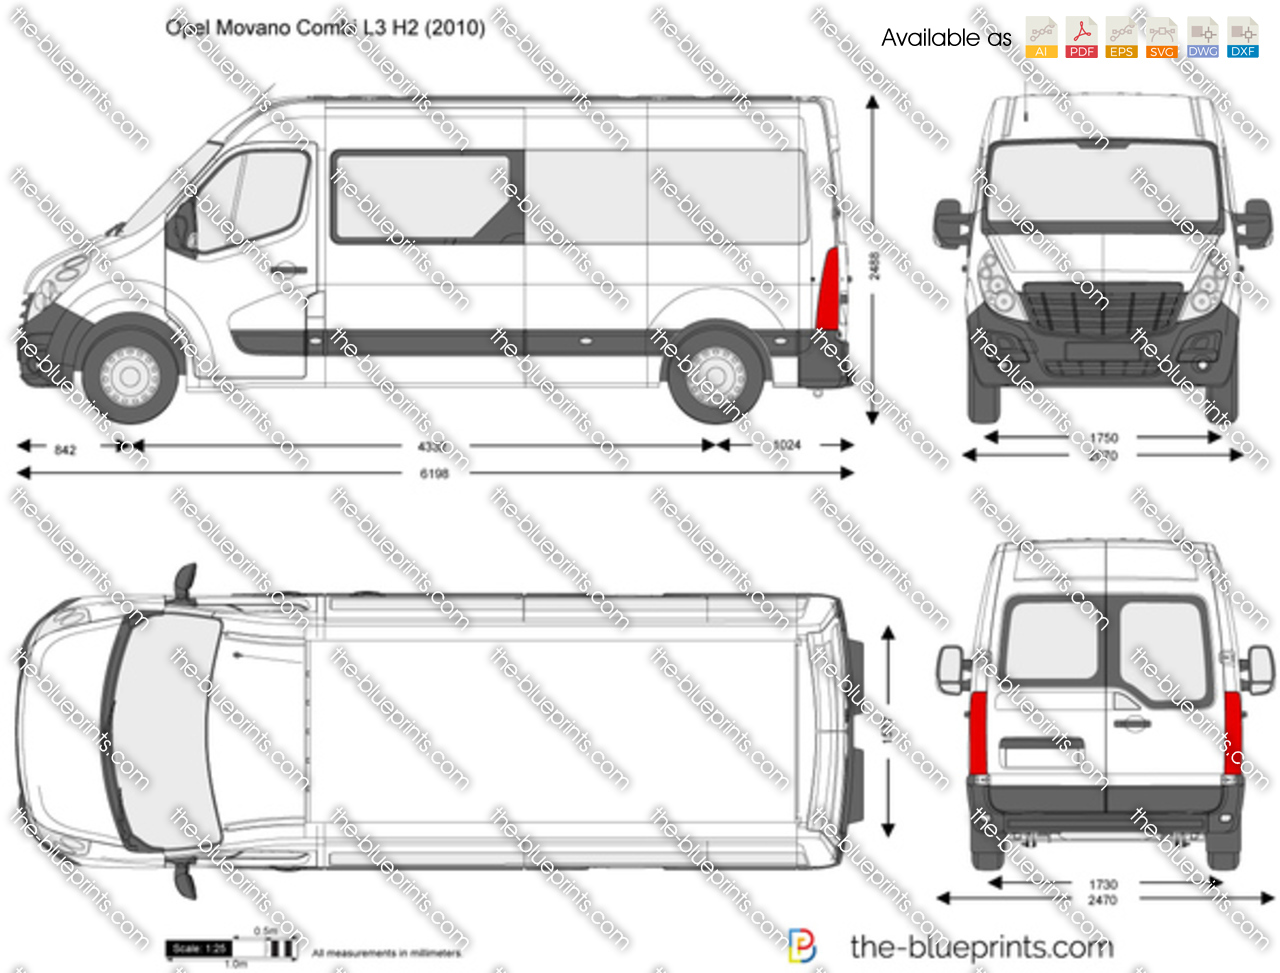 Opel Movano Combi L3 H2 Vector Drawing